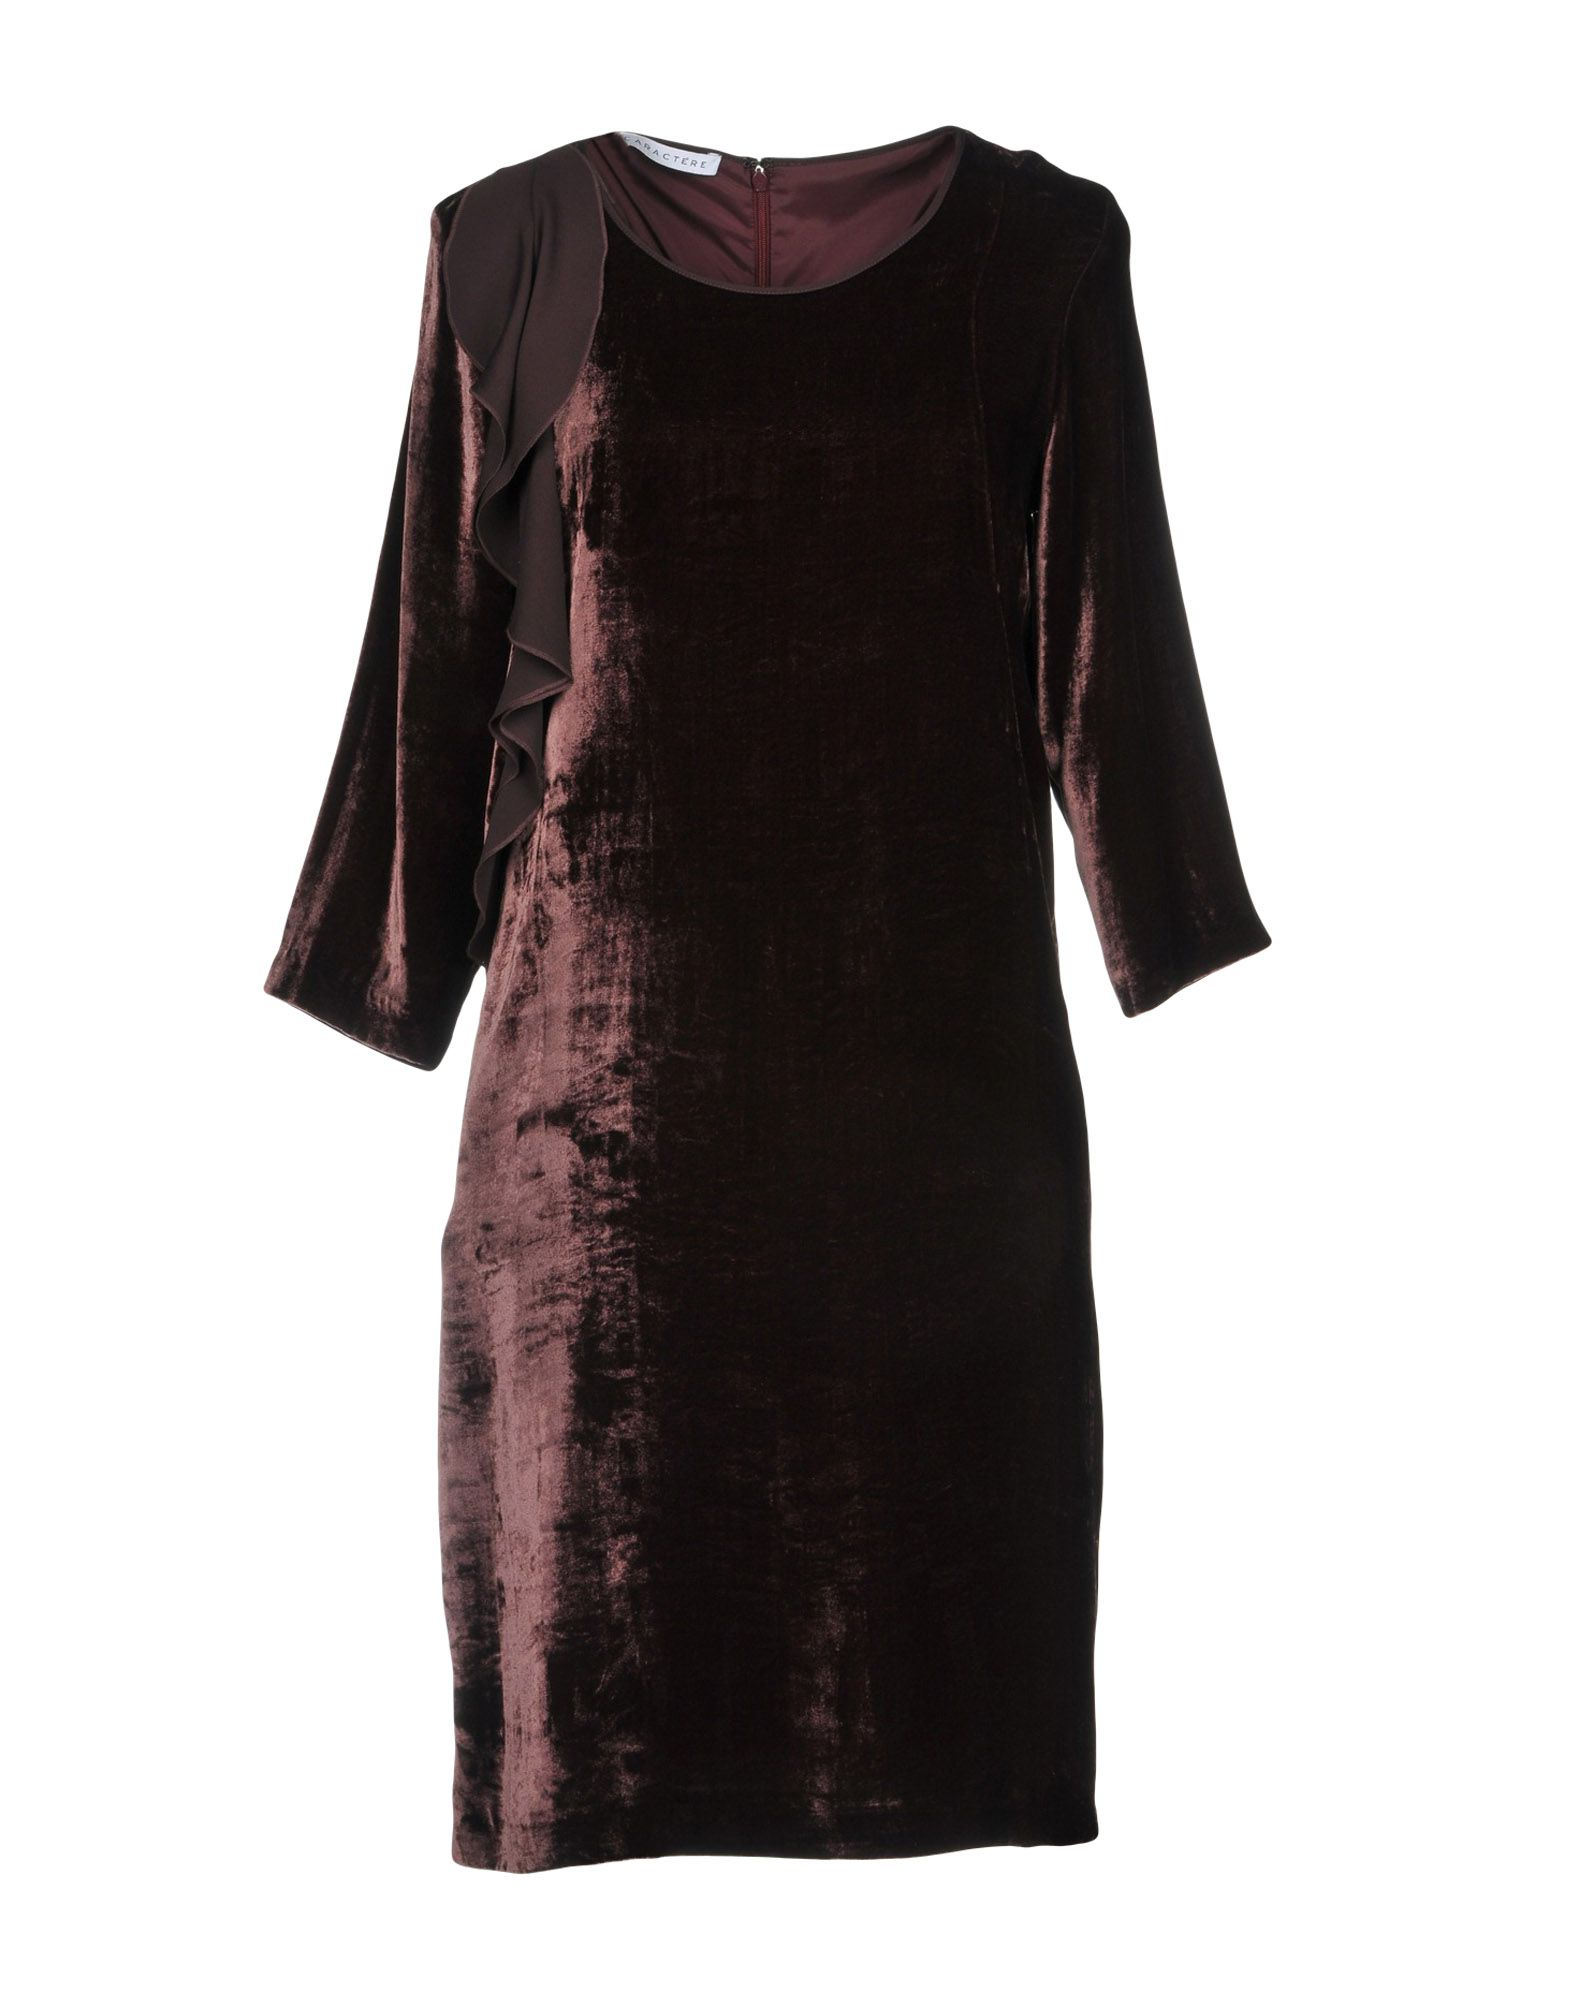 28d7d04b1c7e Γυναικεία Βελούδινα Φορέματα Online - Κορυφαία προϊόντα - Σελίδα 14 ...